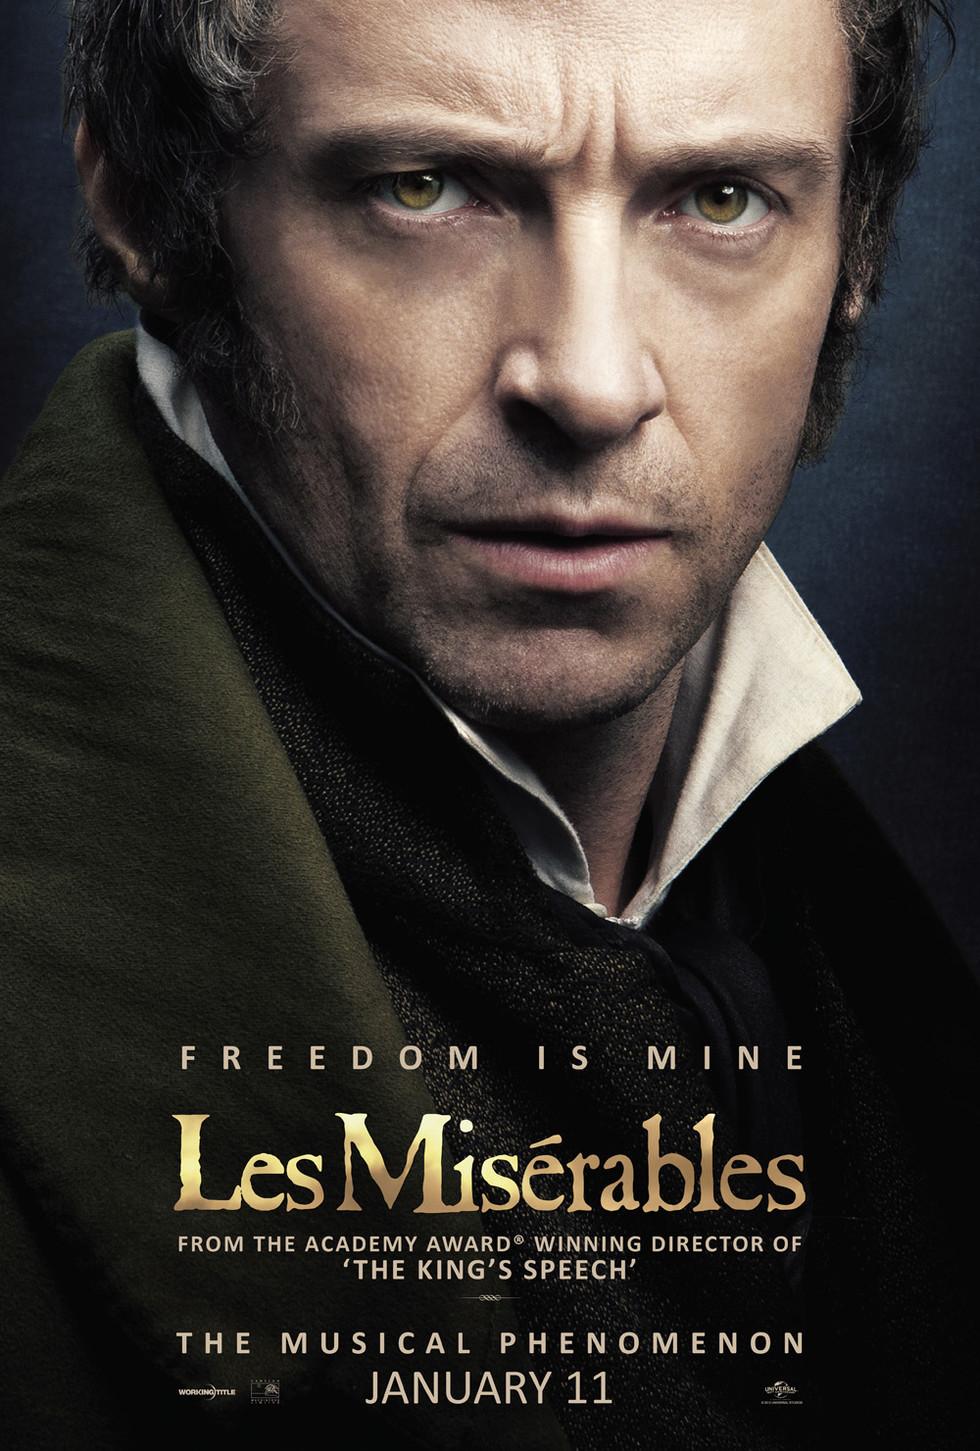 Les Miserables - Movie Poster #2 (Large)